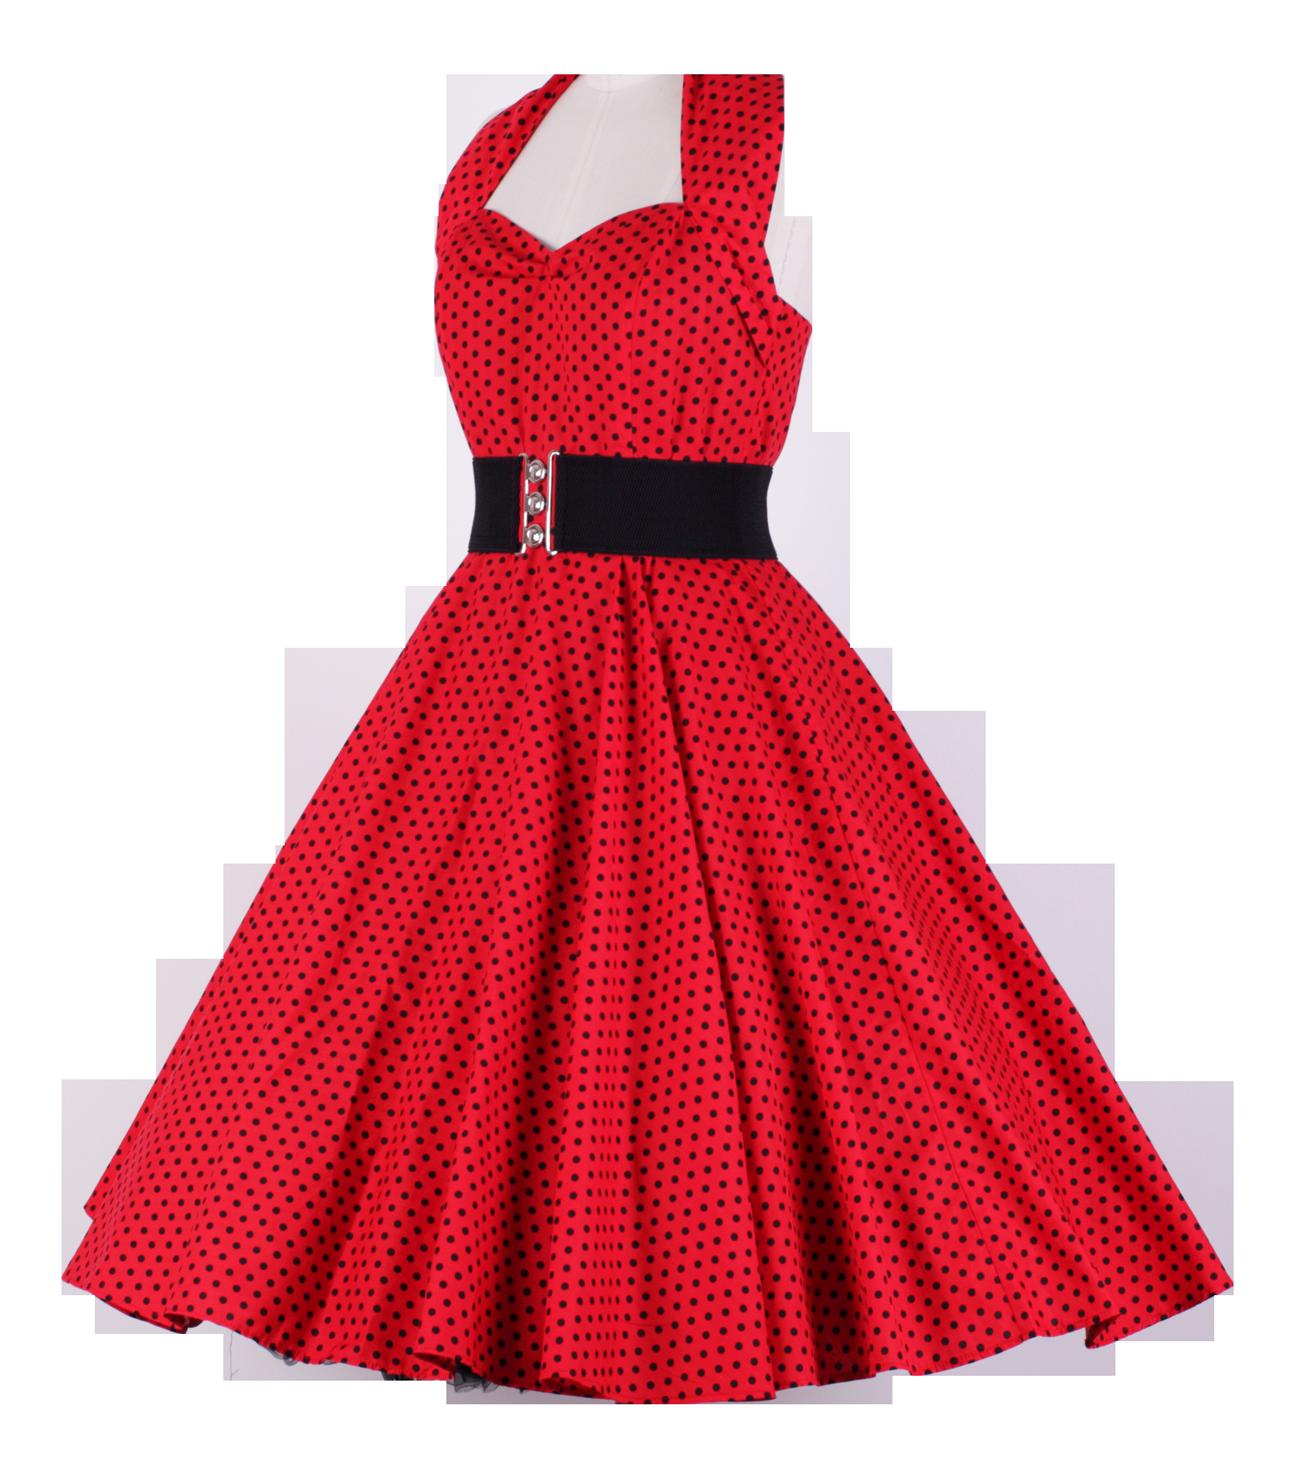 Woman Dress PNG Image